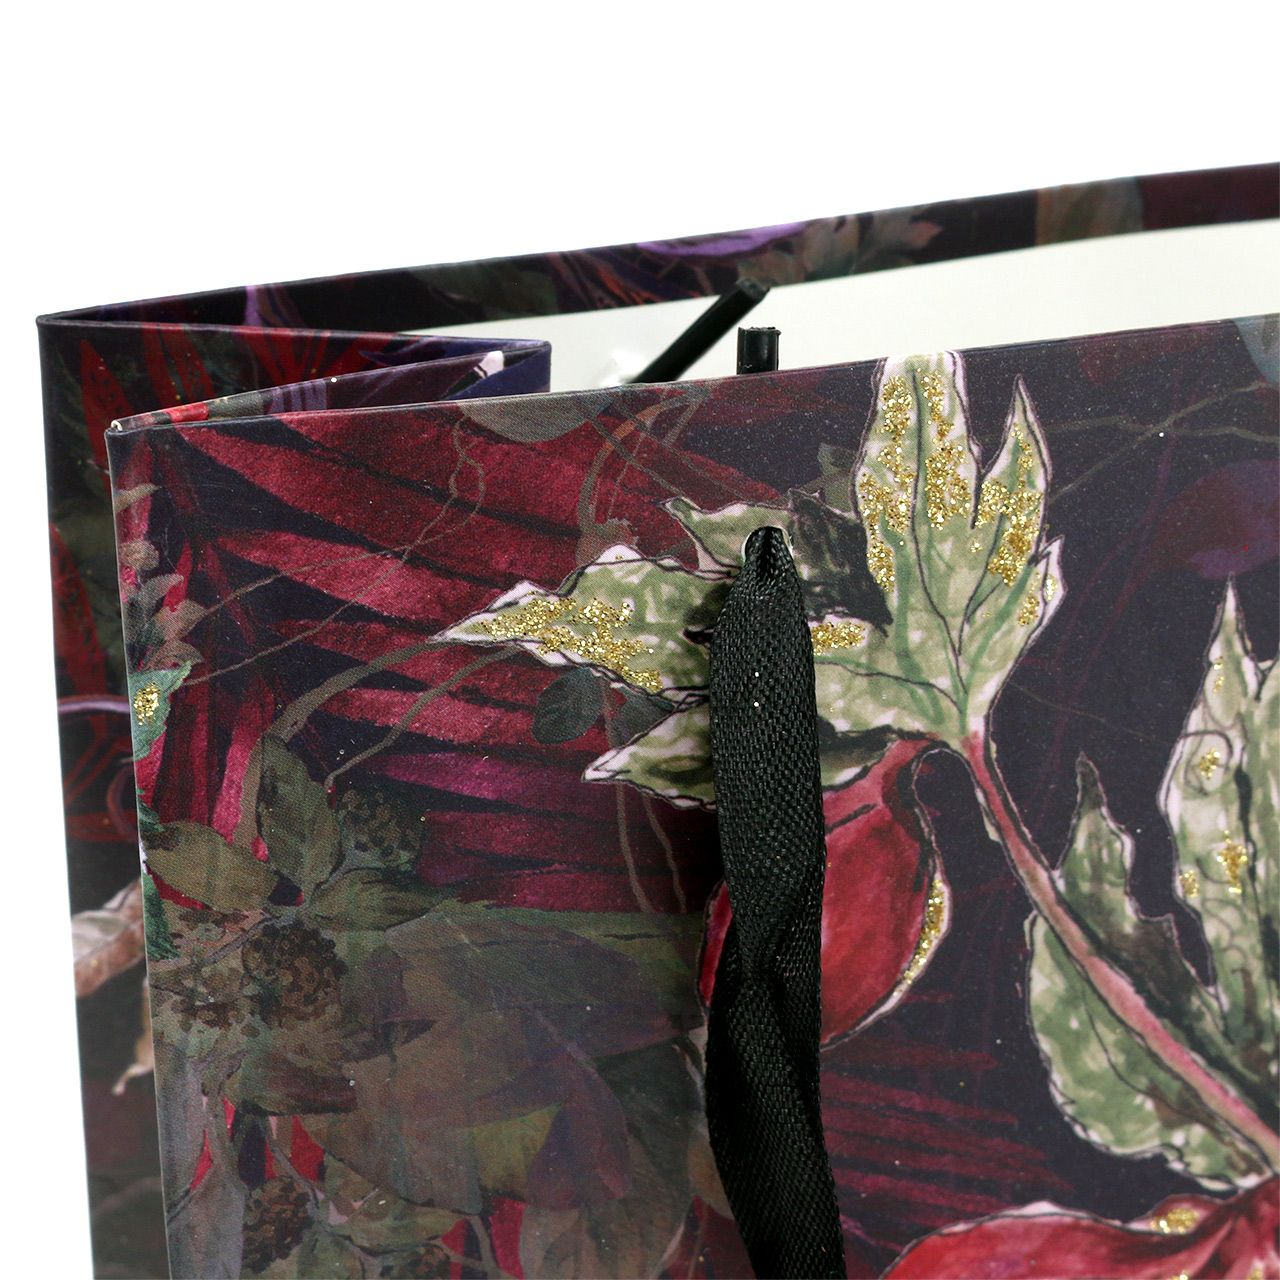 Presentpåse blommor guld 18cm x 8cm H24cm